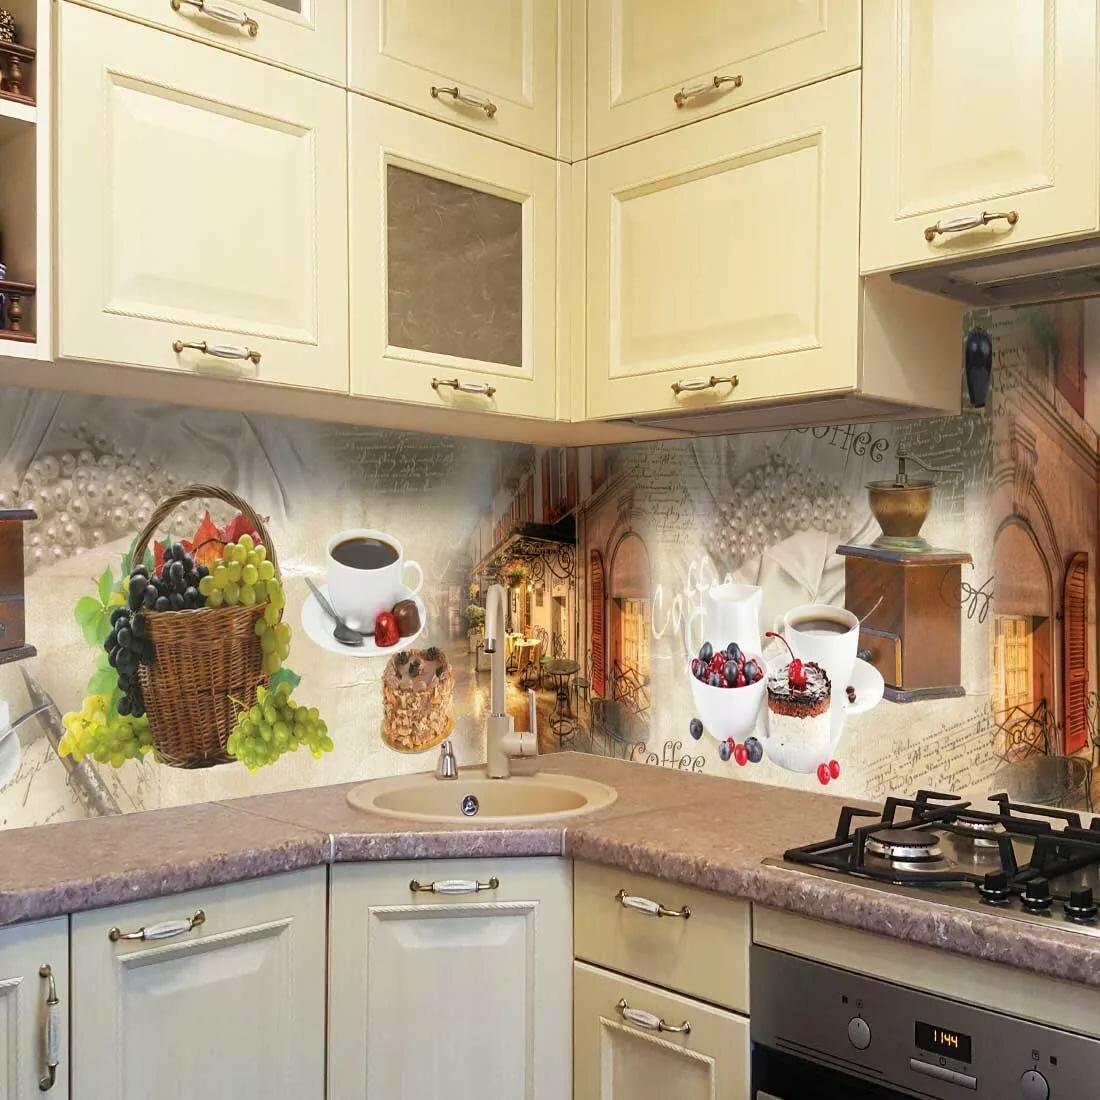 ранними постер на фартук в кухне фото могут столкнуться